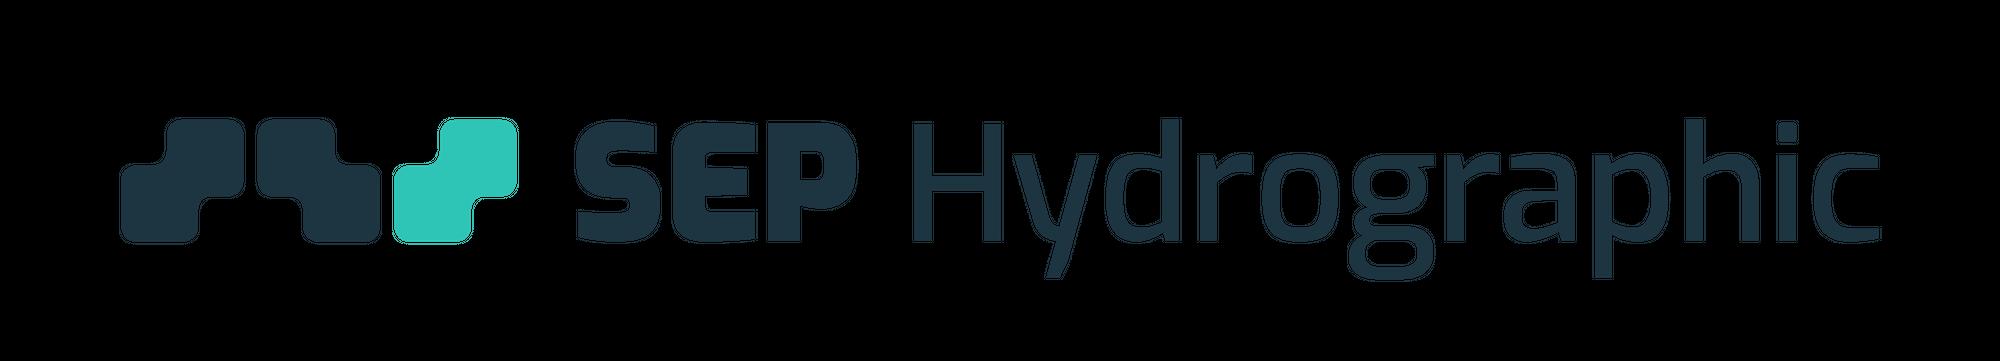 SEP Hydrographic Ltd